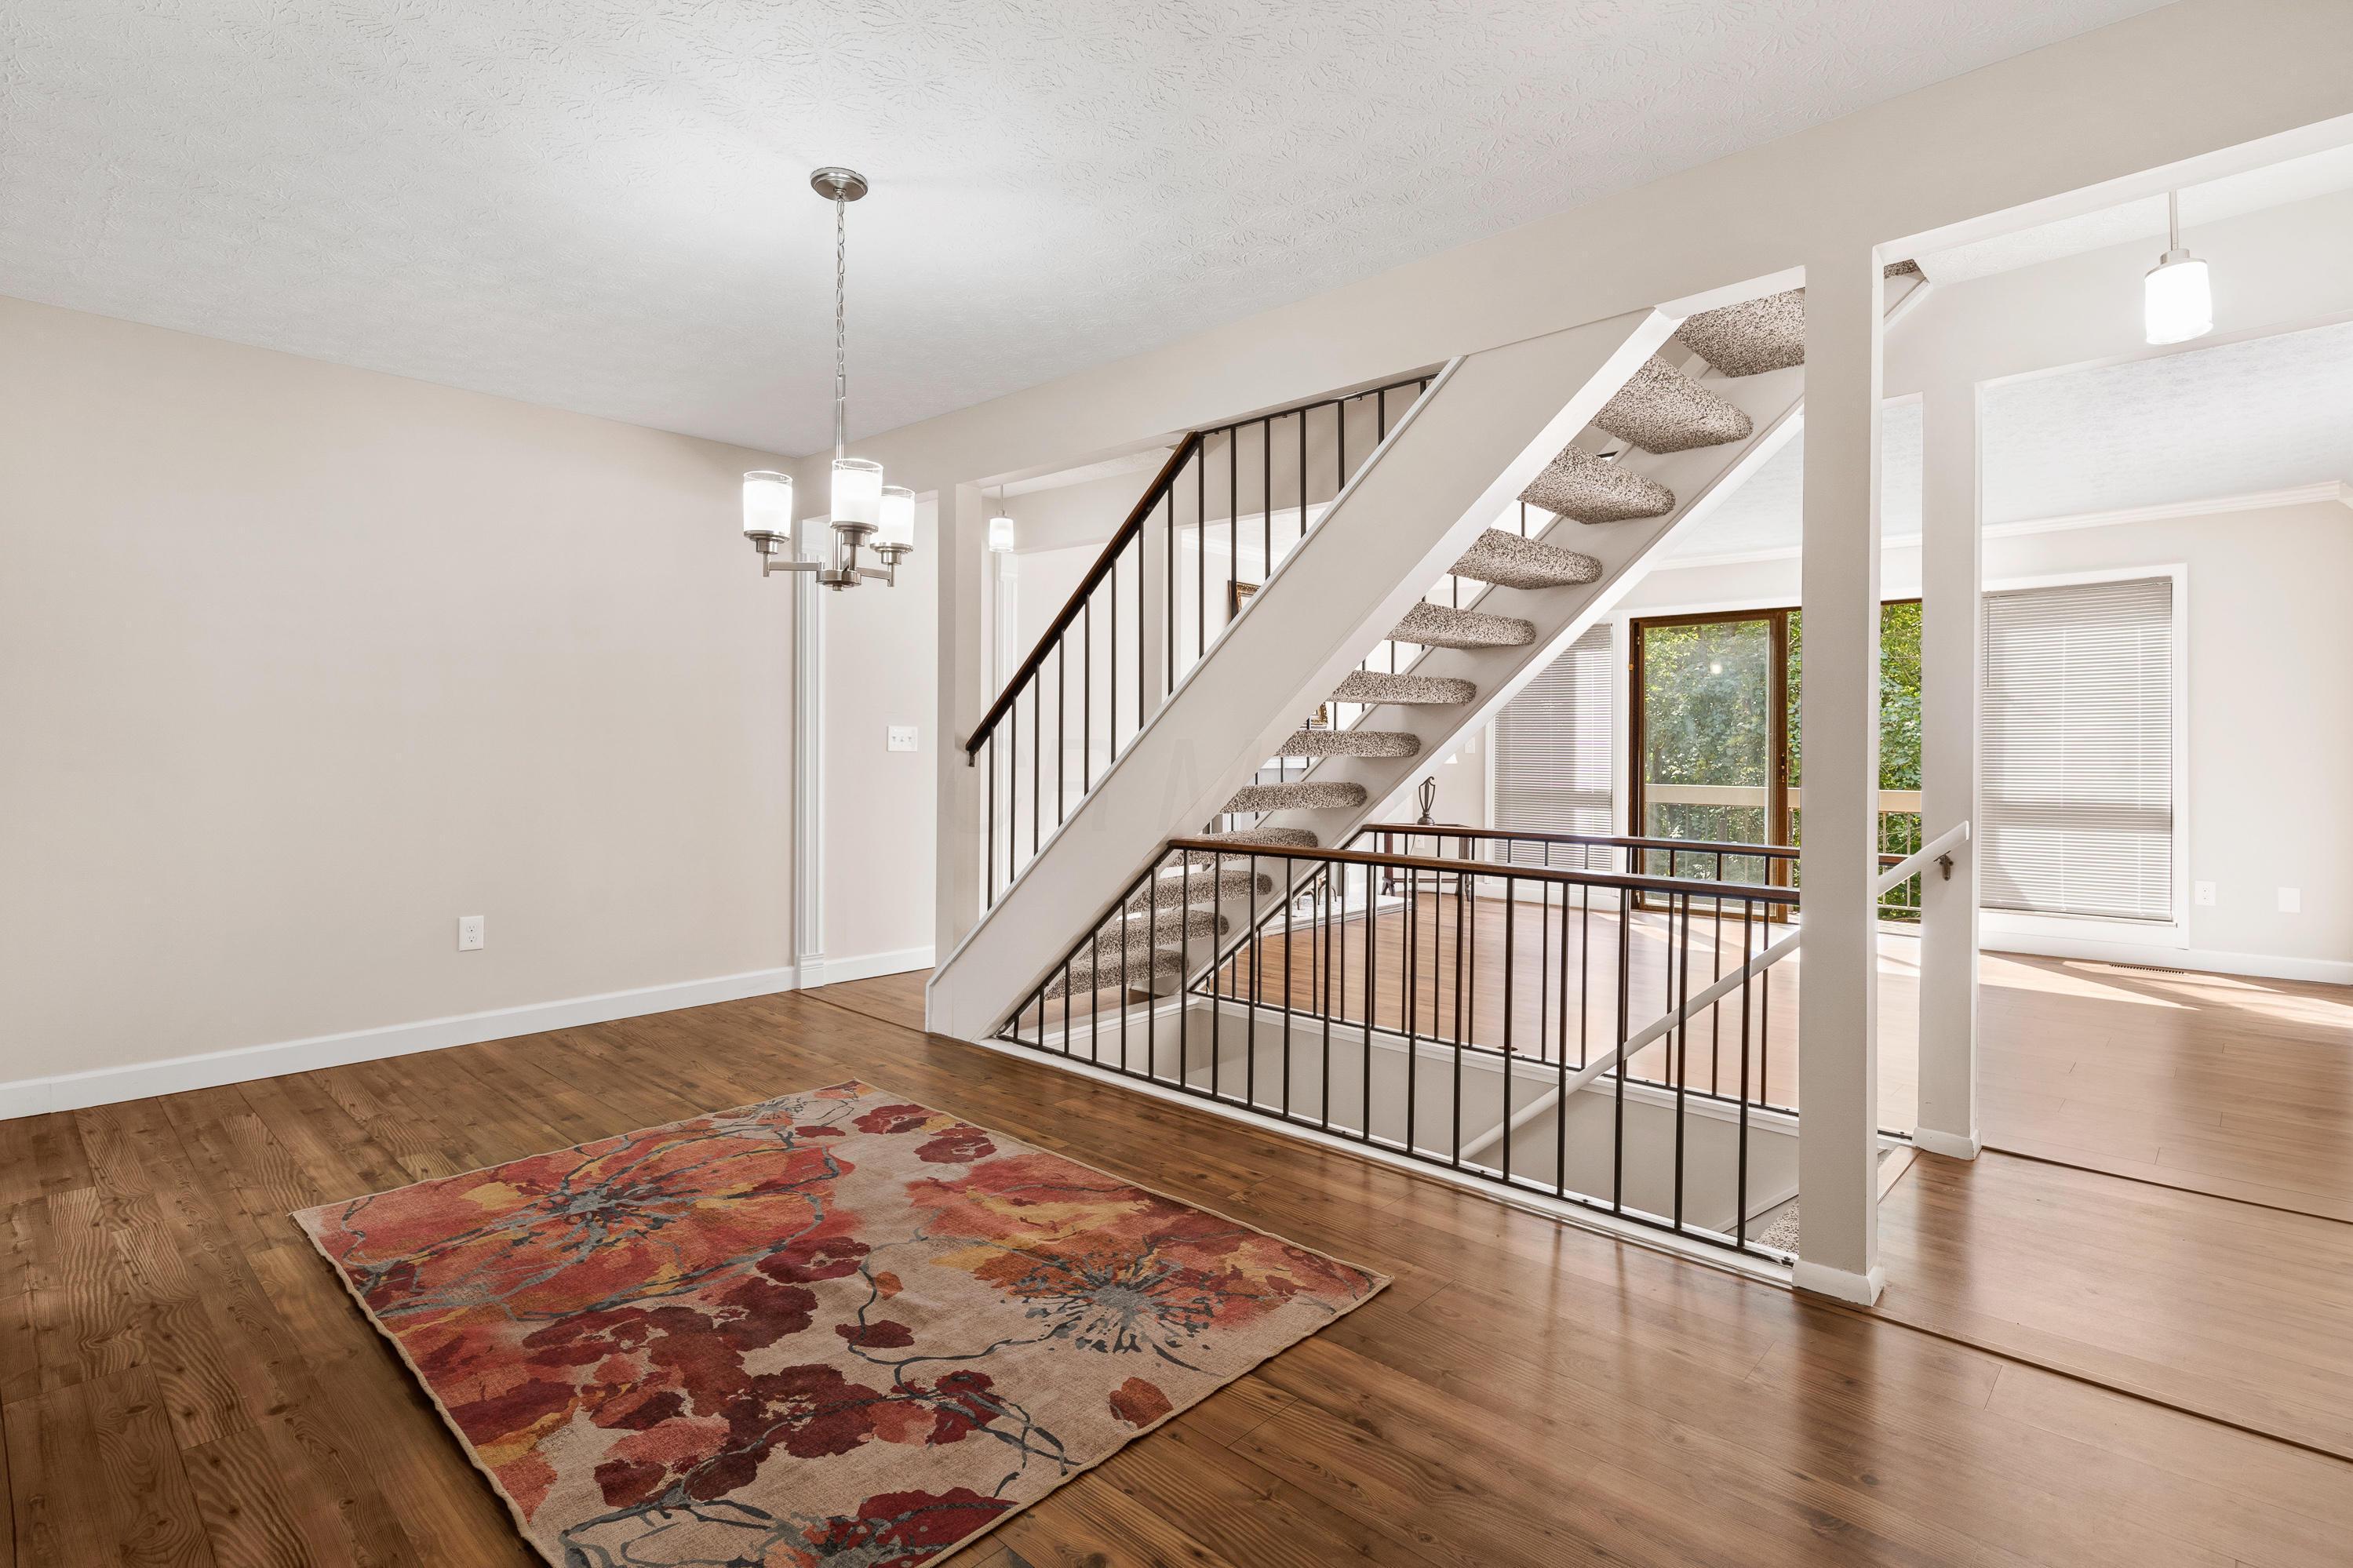 3155 Walden Ravines, Columbus, Ohio 43221, 2 Bedrooms Bedrooms, ,4 BathroomsBathrooms,Residential,For Sale,Walden Ravines,220031839